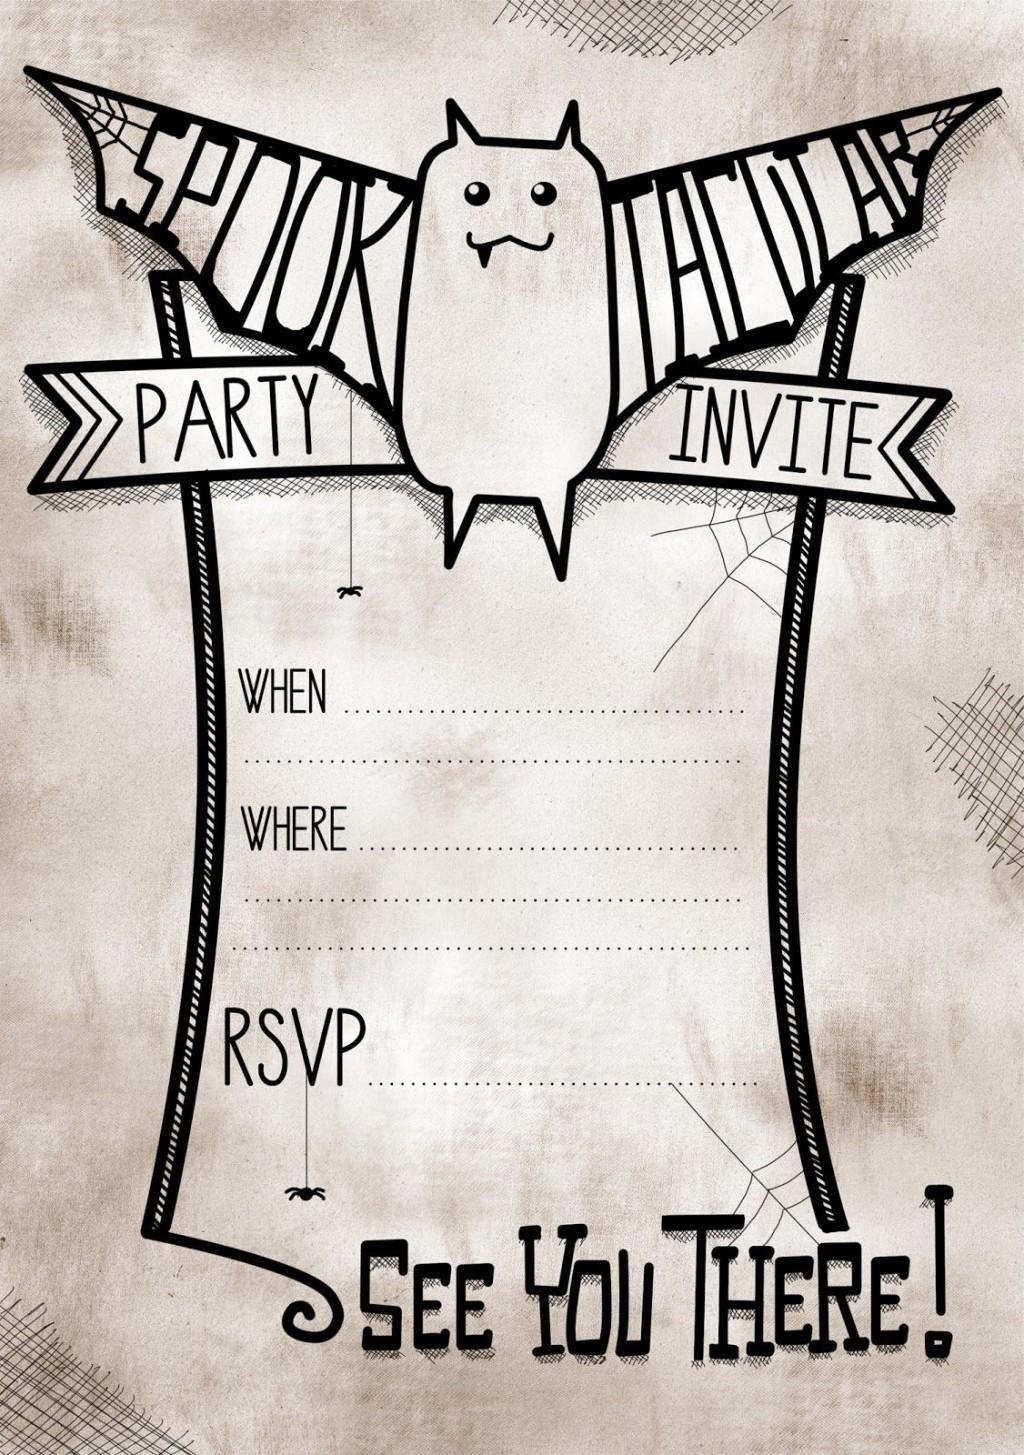 009 Breathtaking Free Halloween Invitation Template Sample  Templates Microsoft Word Wedding Printable PartyLarge